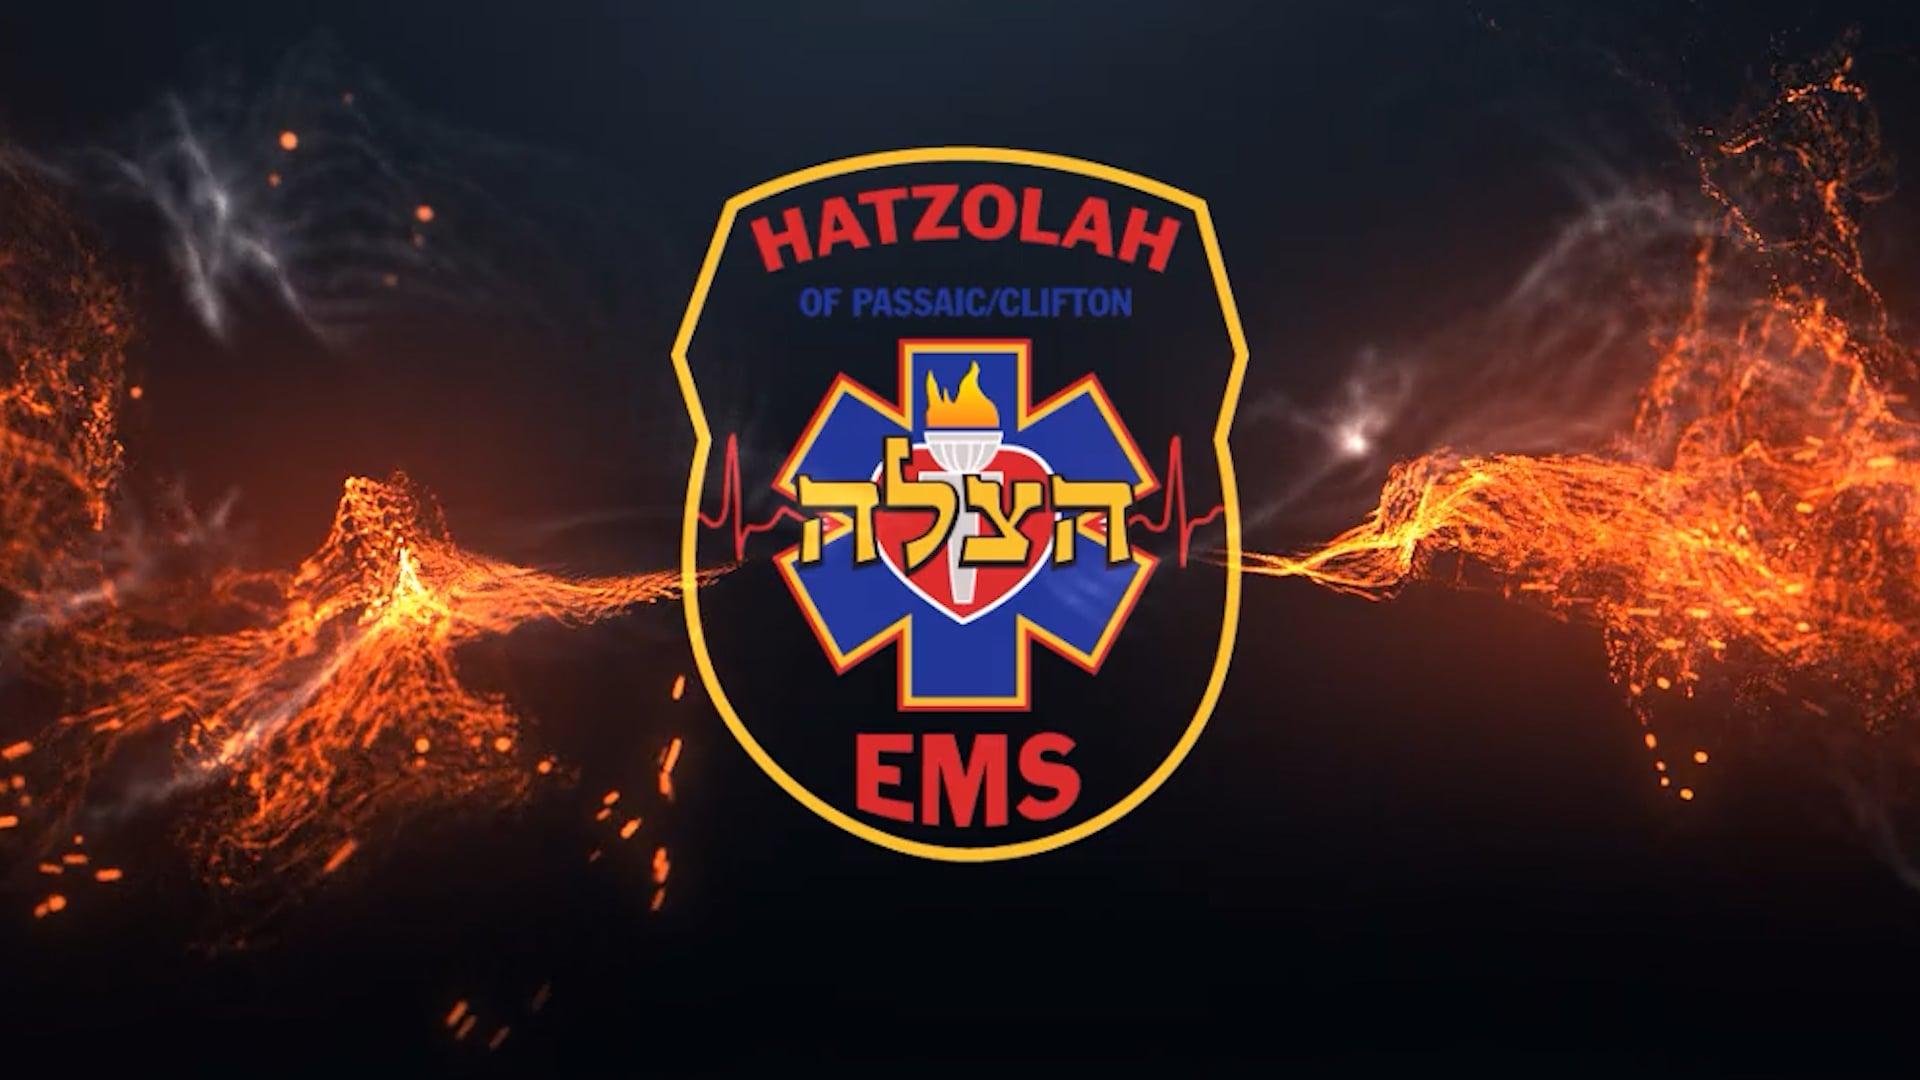 Hatzolah Of Passaic-Clifton EMS 2020 (Official video)